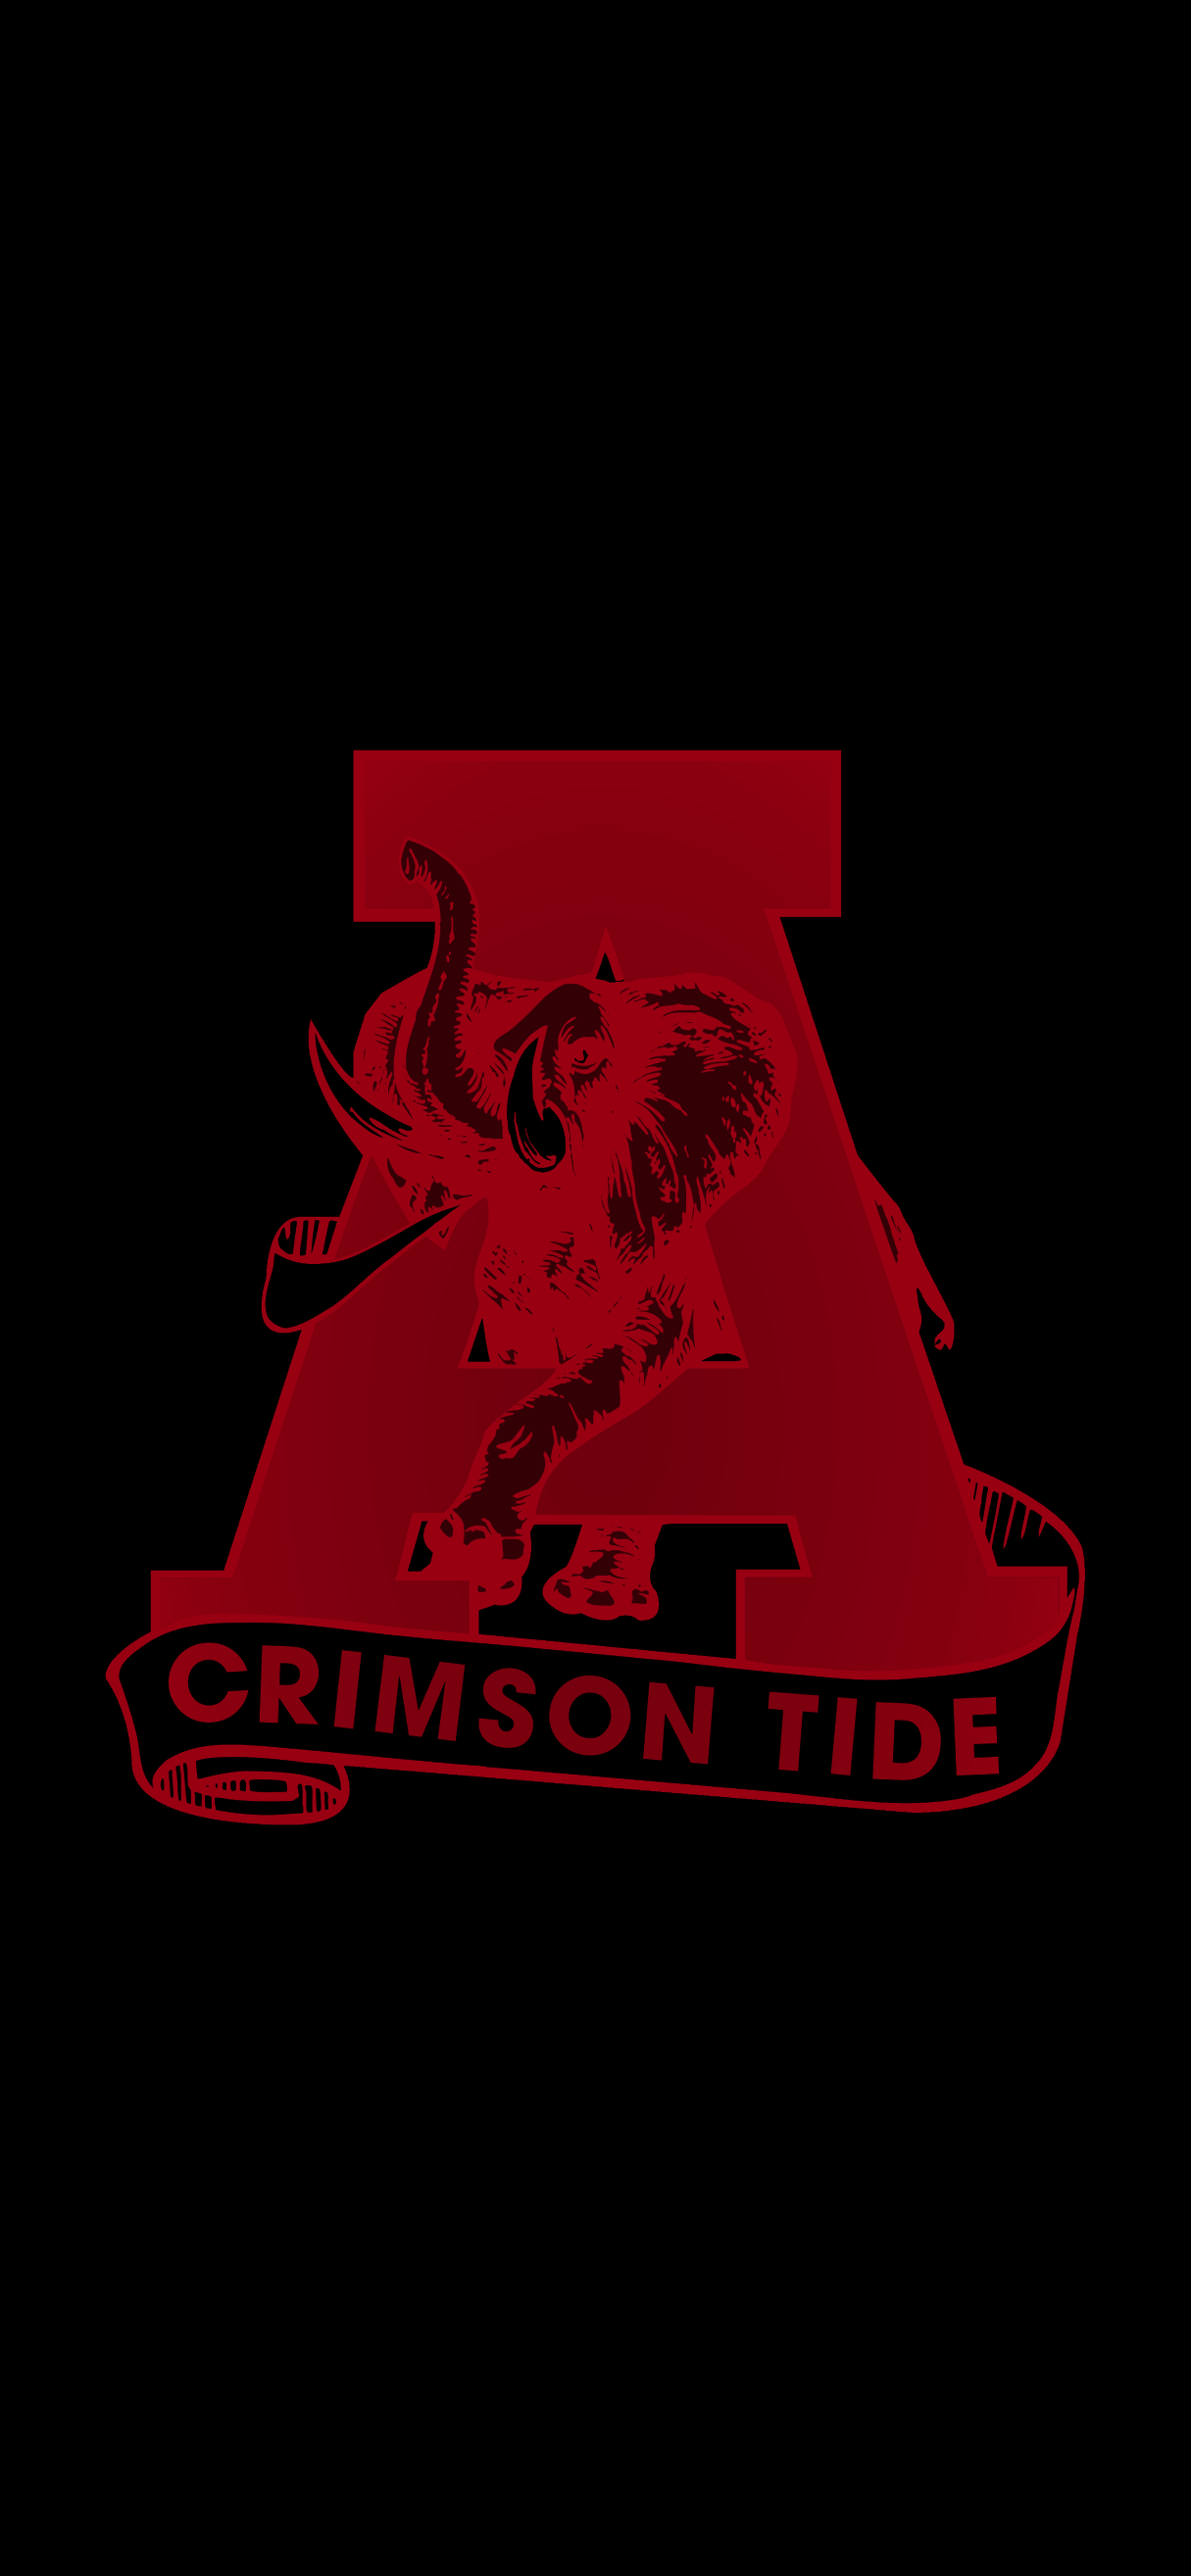 Alabama Crimson Tide Football Wallpaper Iphone Android 24